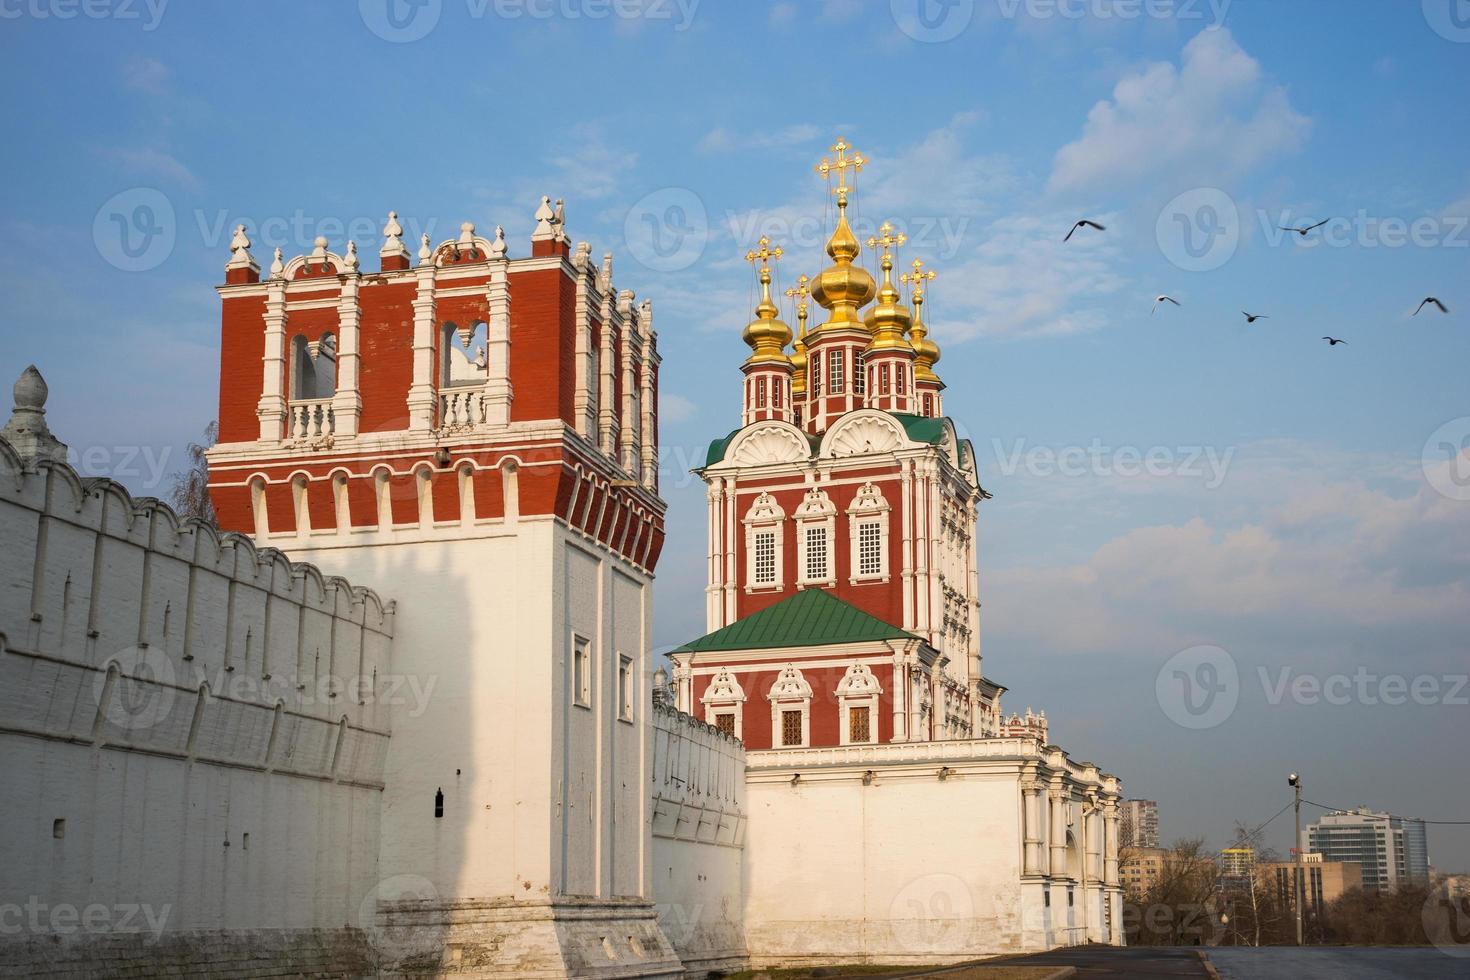 prachtig uitzicht op novodevitsji klooster in Moskou, Rusland foto